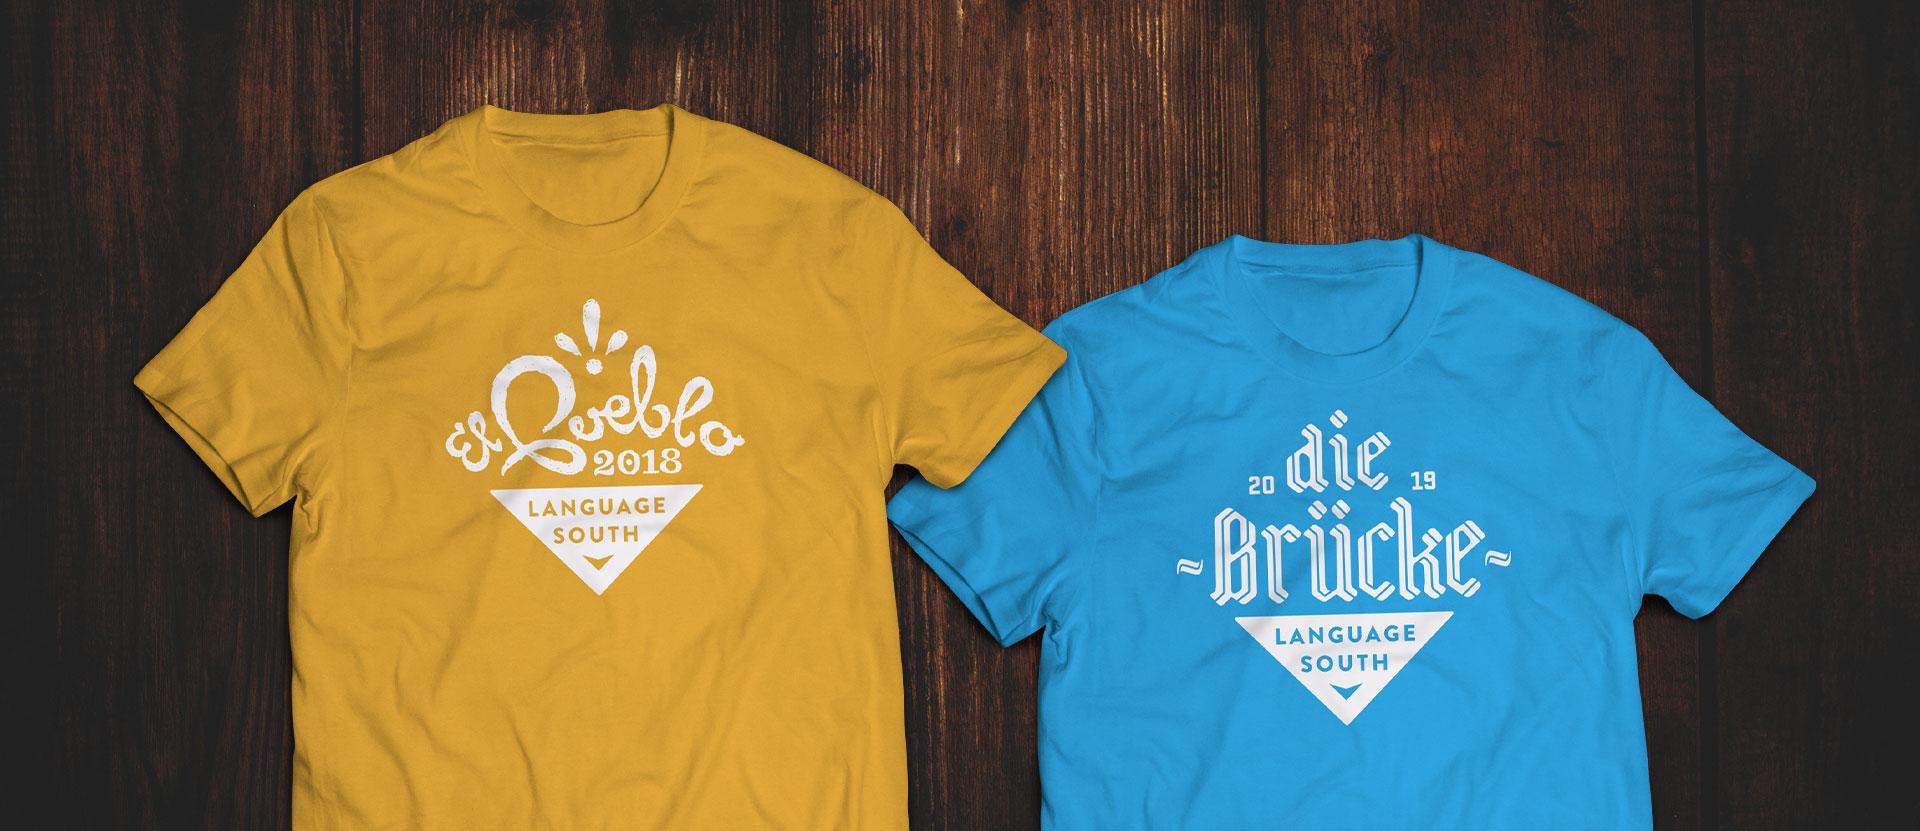 Language South - Print Design, T-Shirt Design, Identity Design, Logos